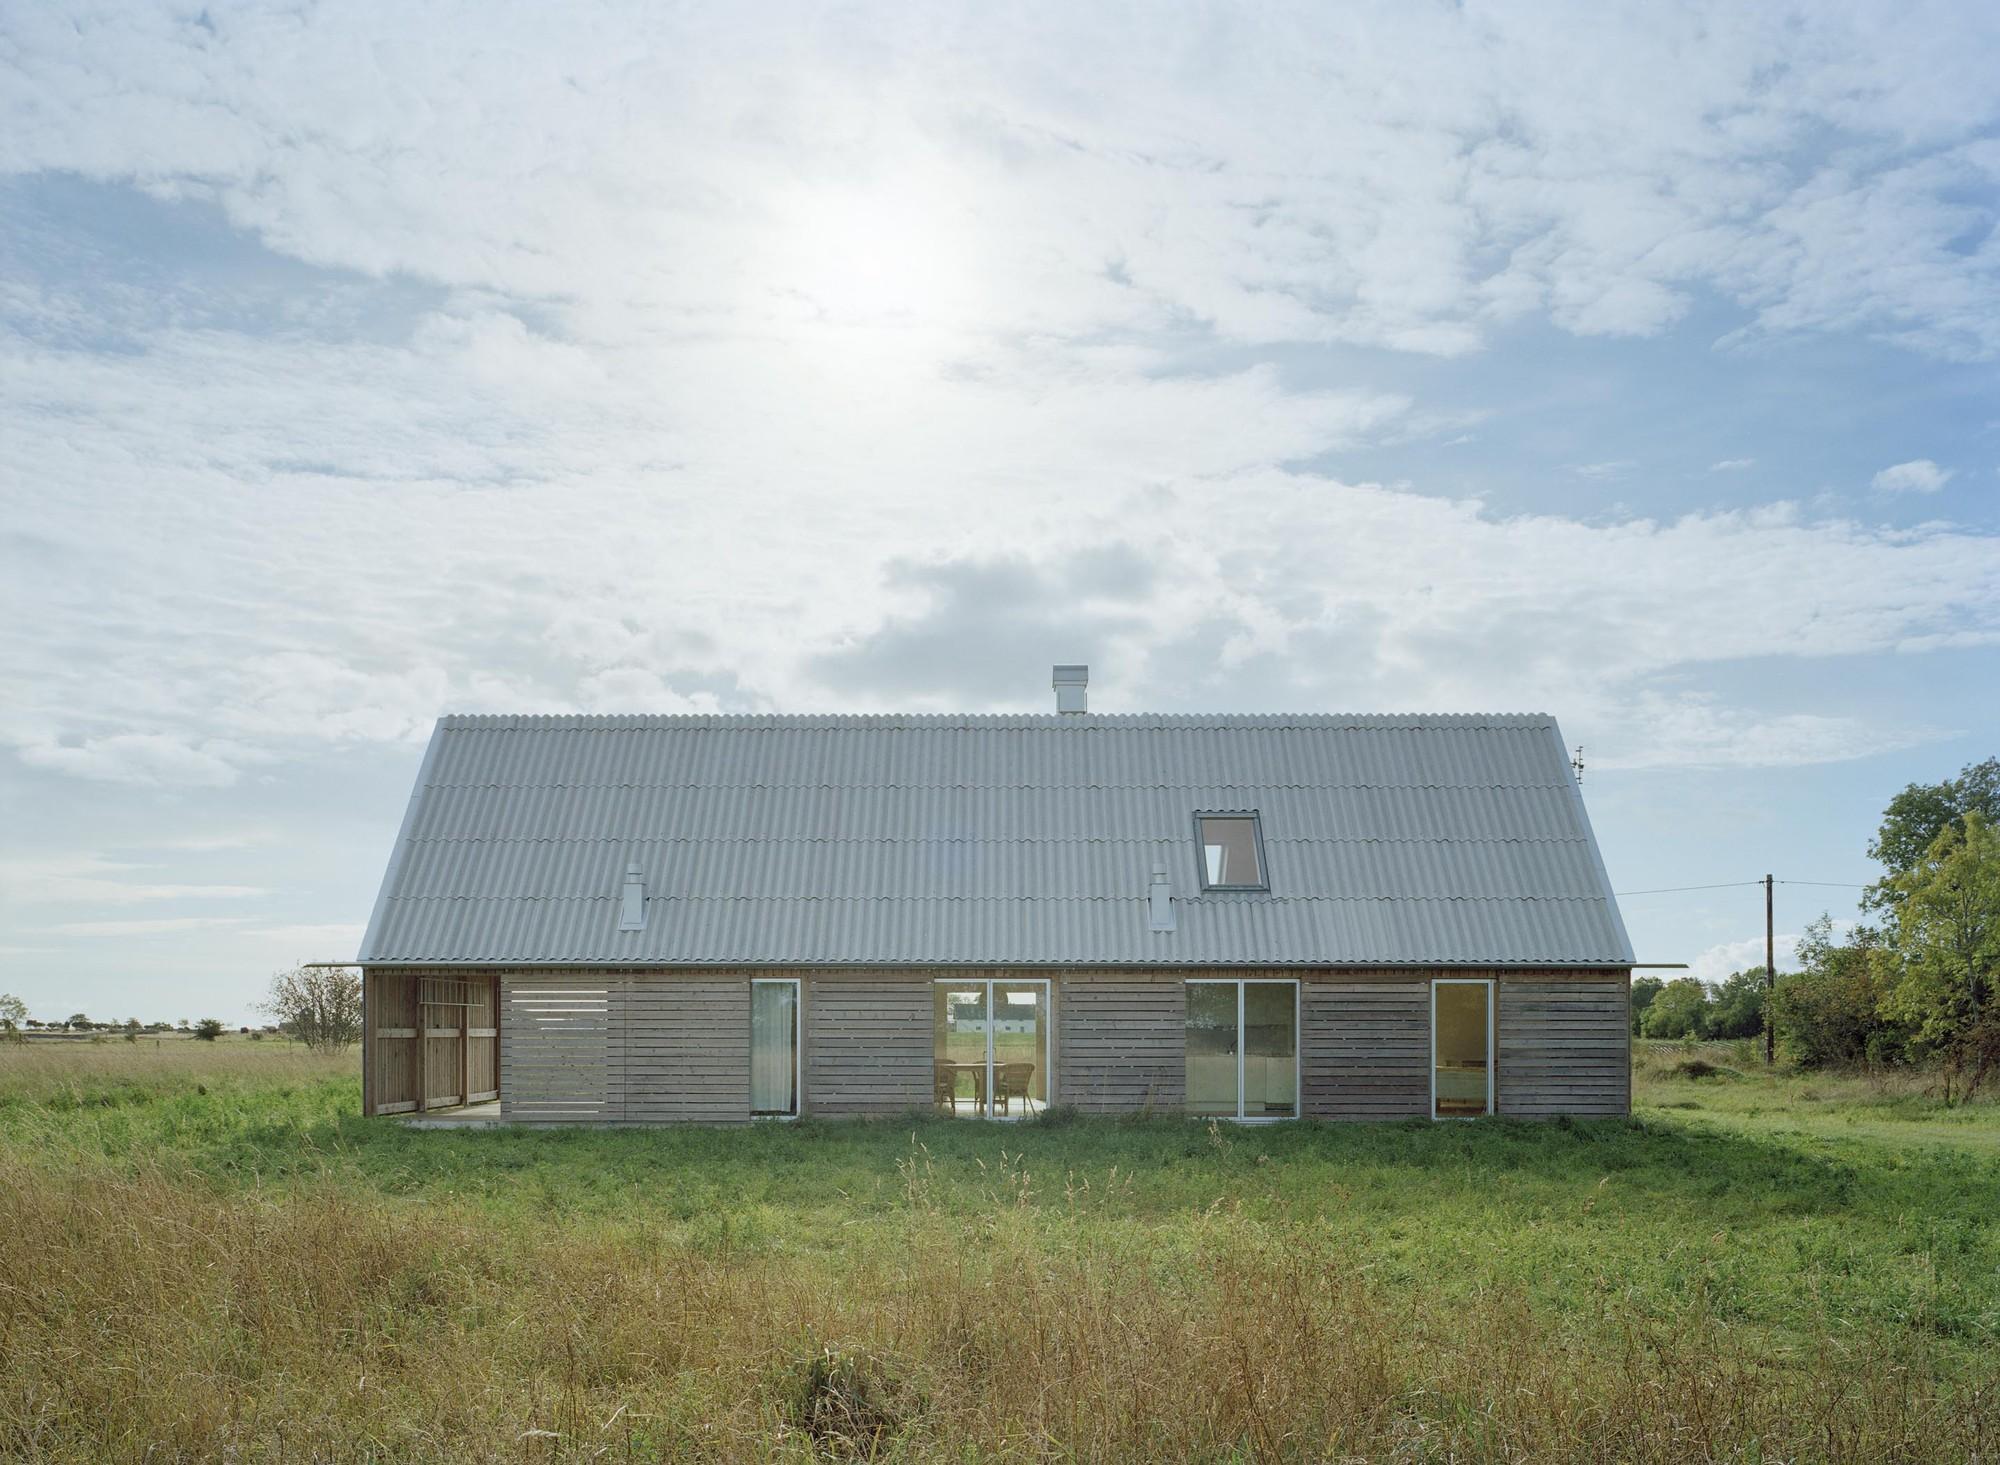 Sommarhus at Stora Gasmora / LLP Arkitektkontor, © Åke Eson Lindman